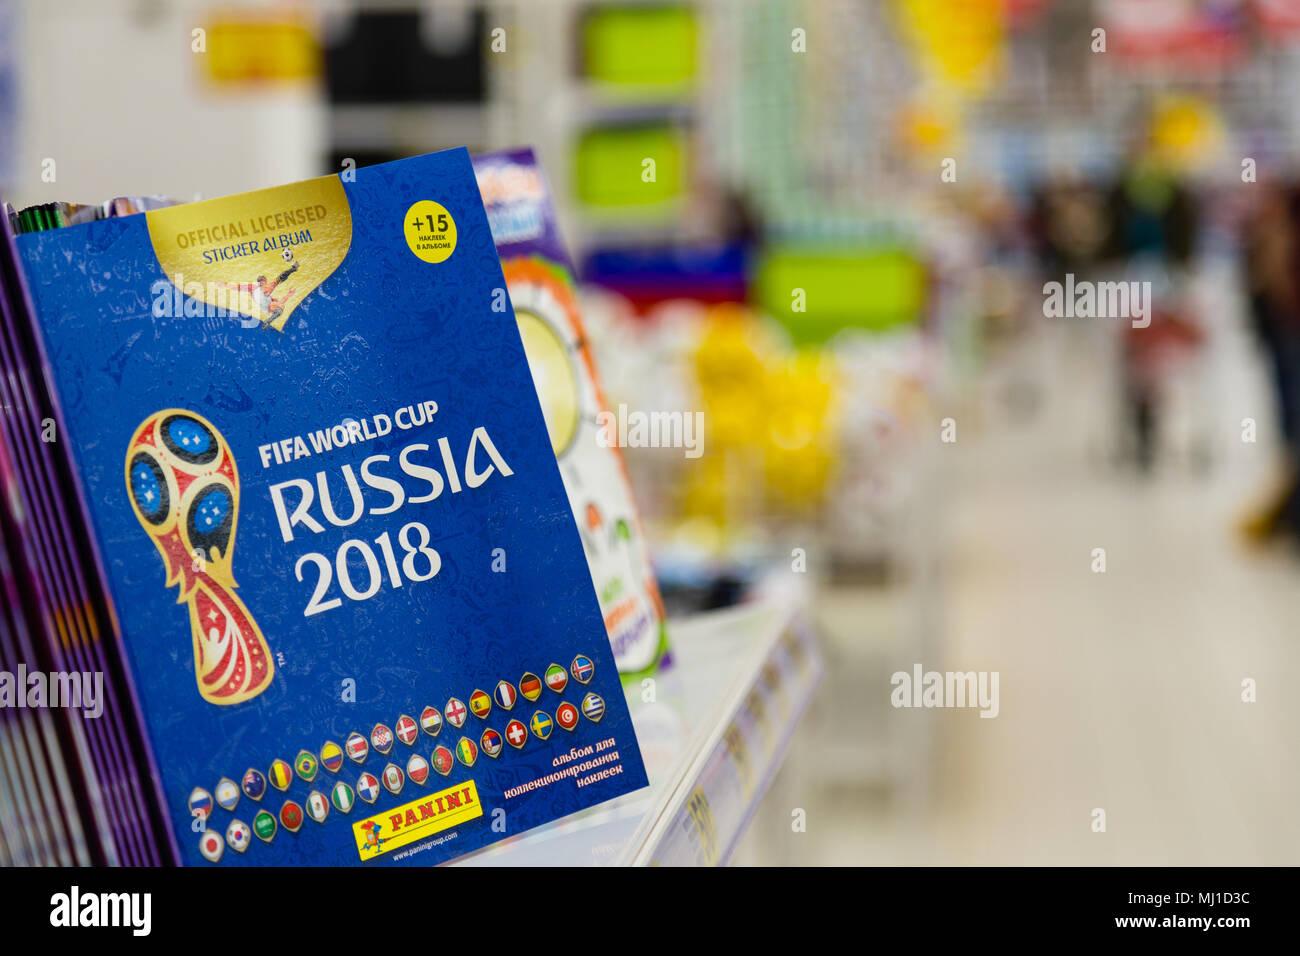 Moskau Russland 27 April 2018 Offizielle Album Für Aufkleber